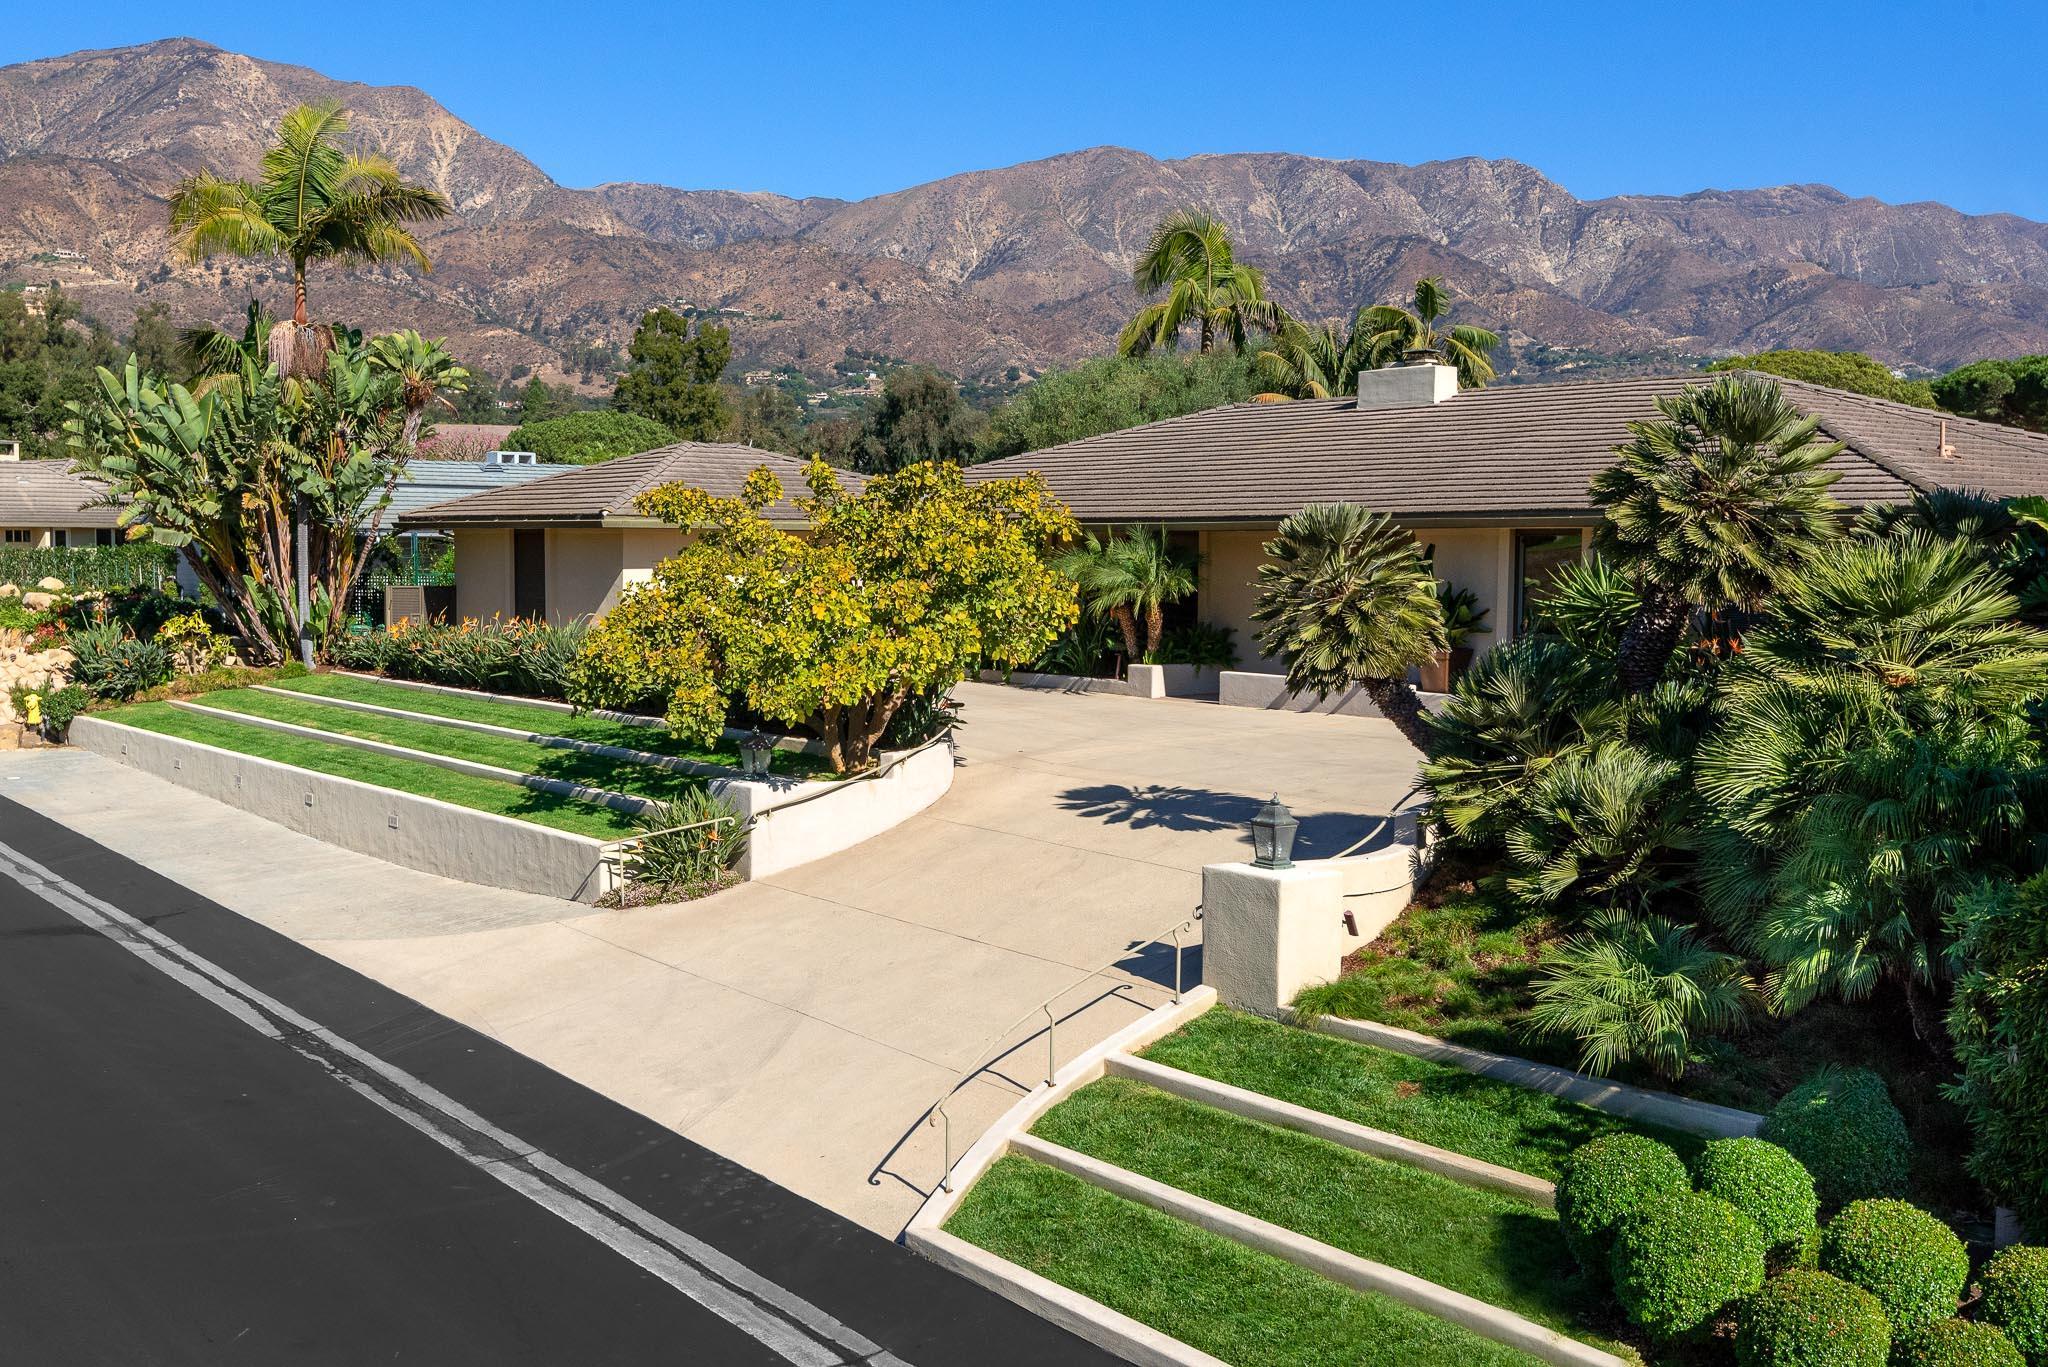 Property photo for 442 Crocker Sperry Dr Santa Barbara, California 93108 - 18-4338